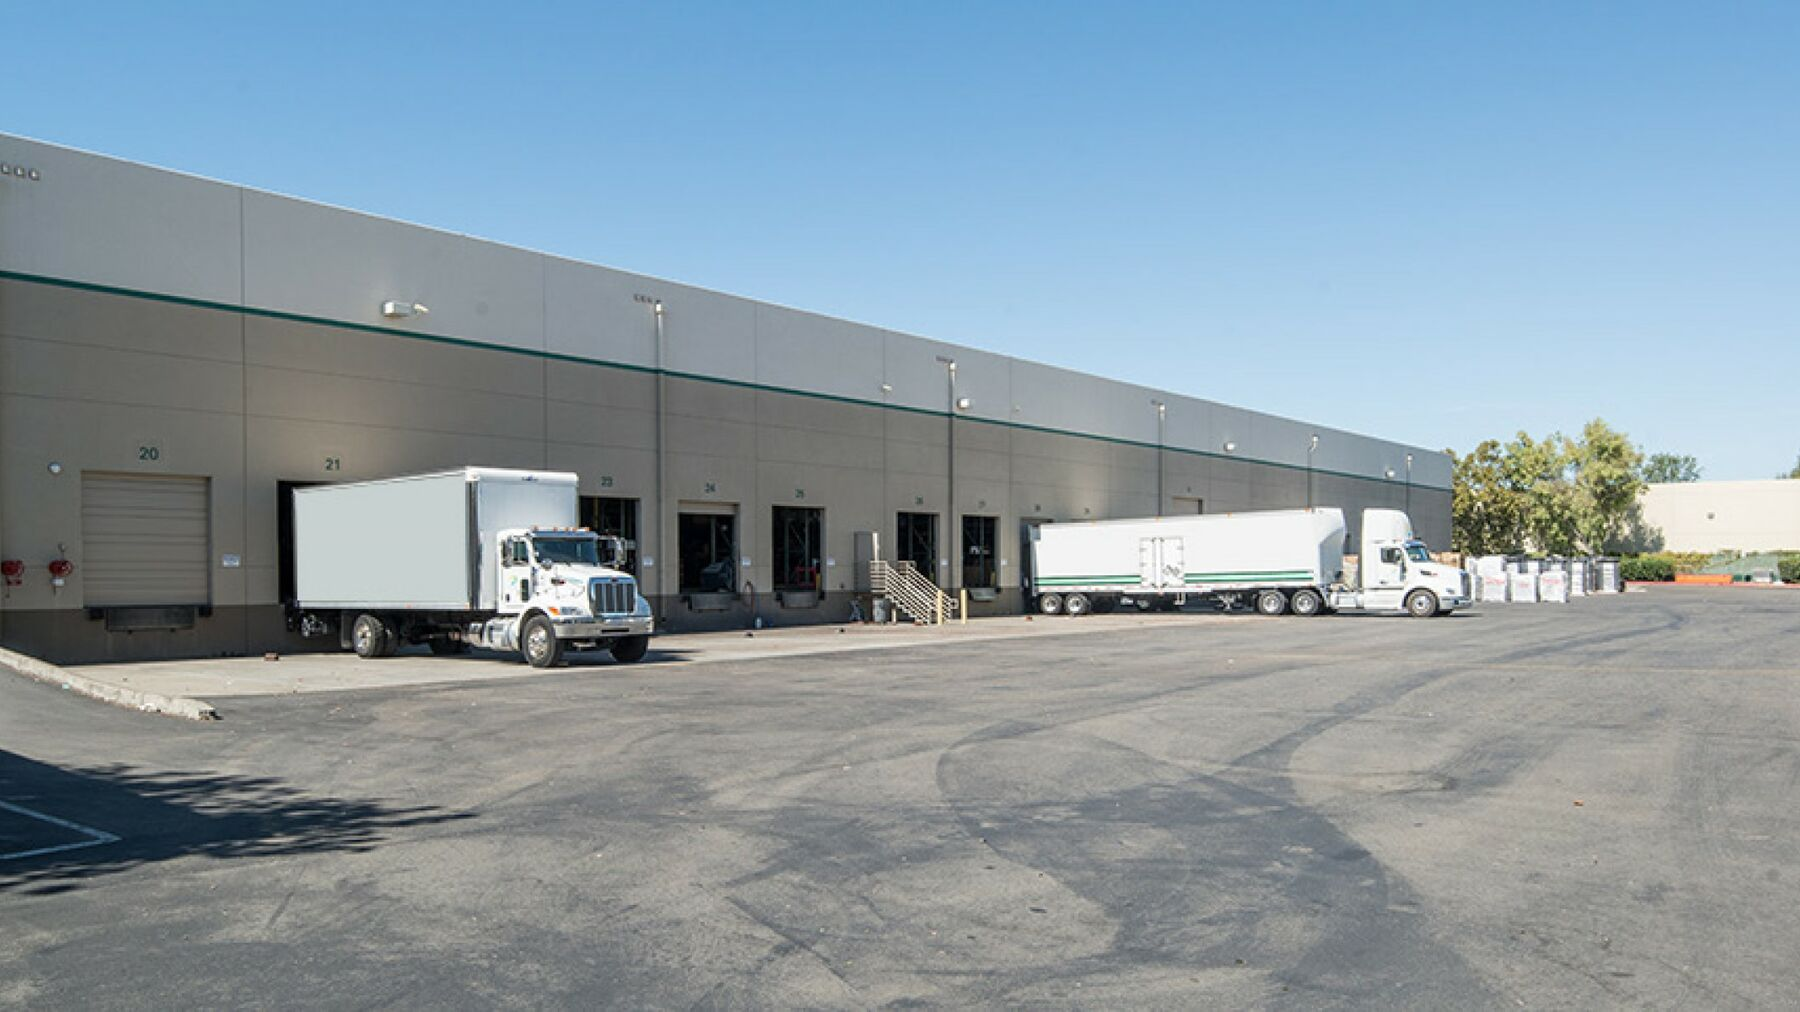 DPM-6150-Las-Positas-Rd-Livermore-1-eba01801-Truck-Court.jpg